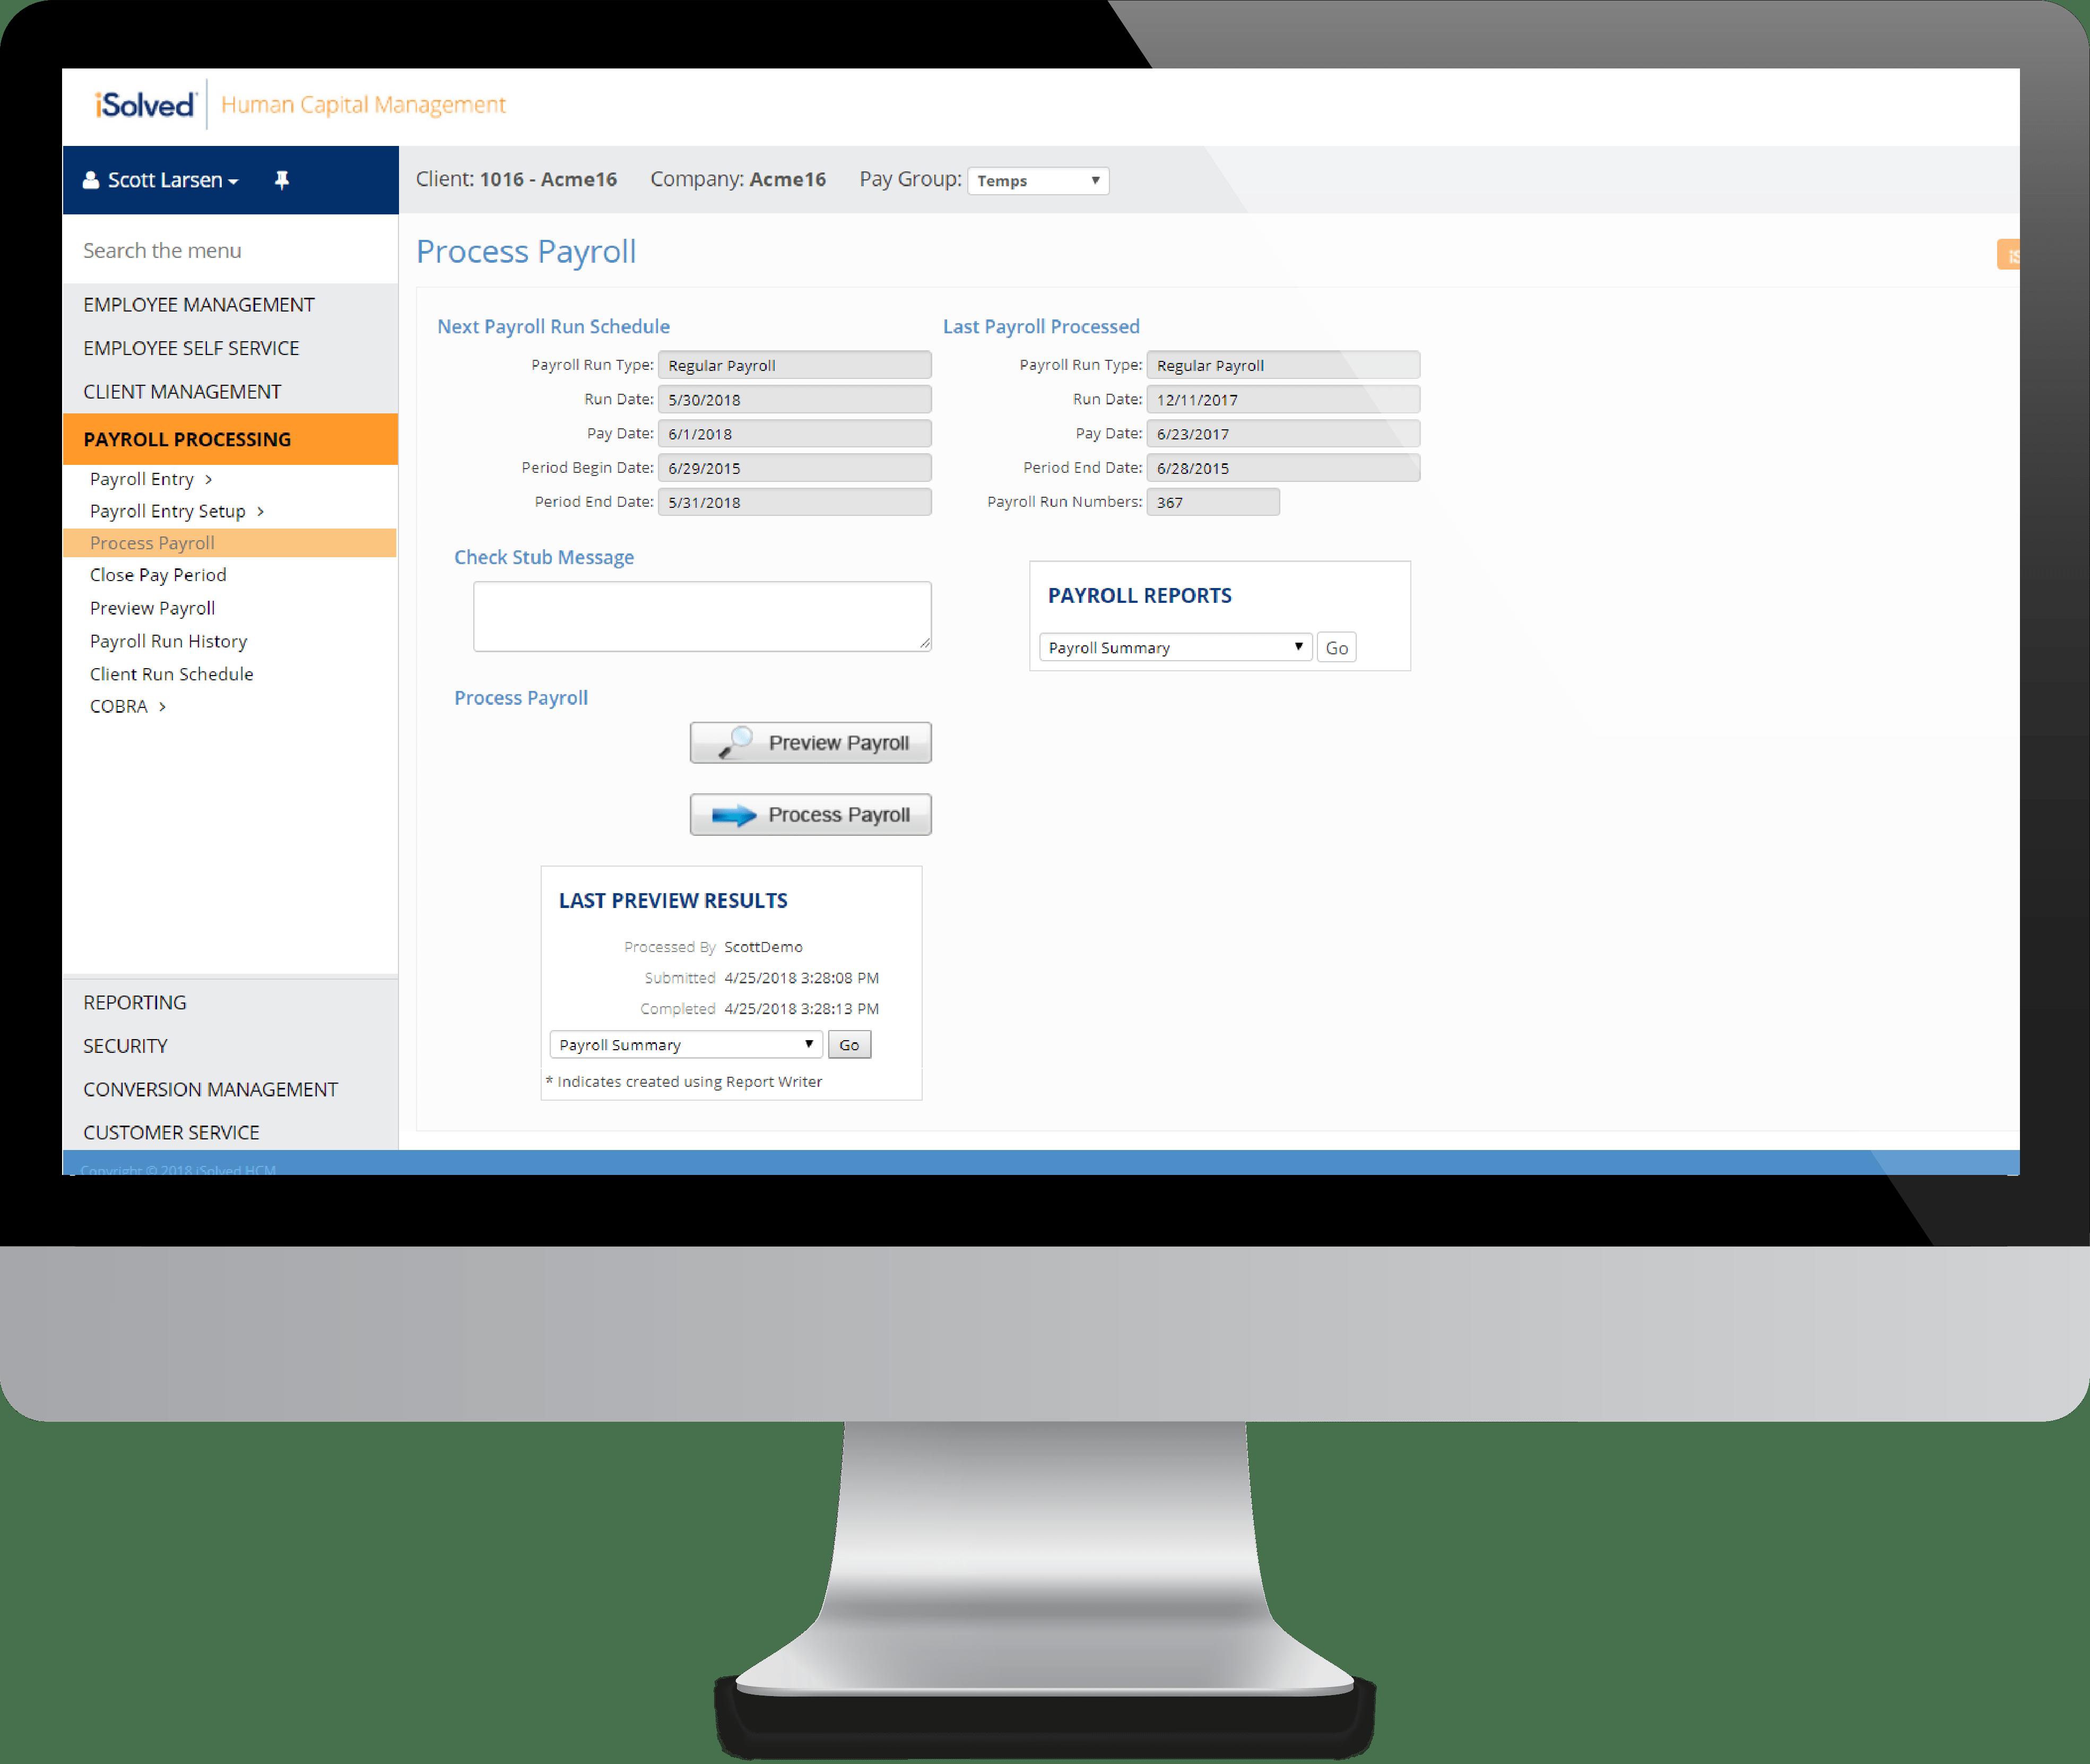 Process Payroll